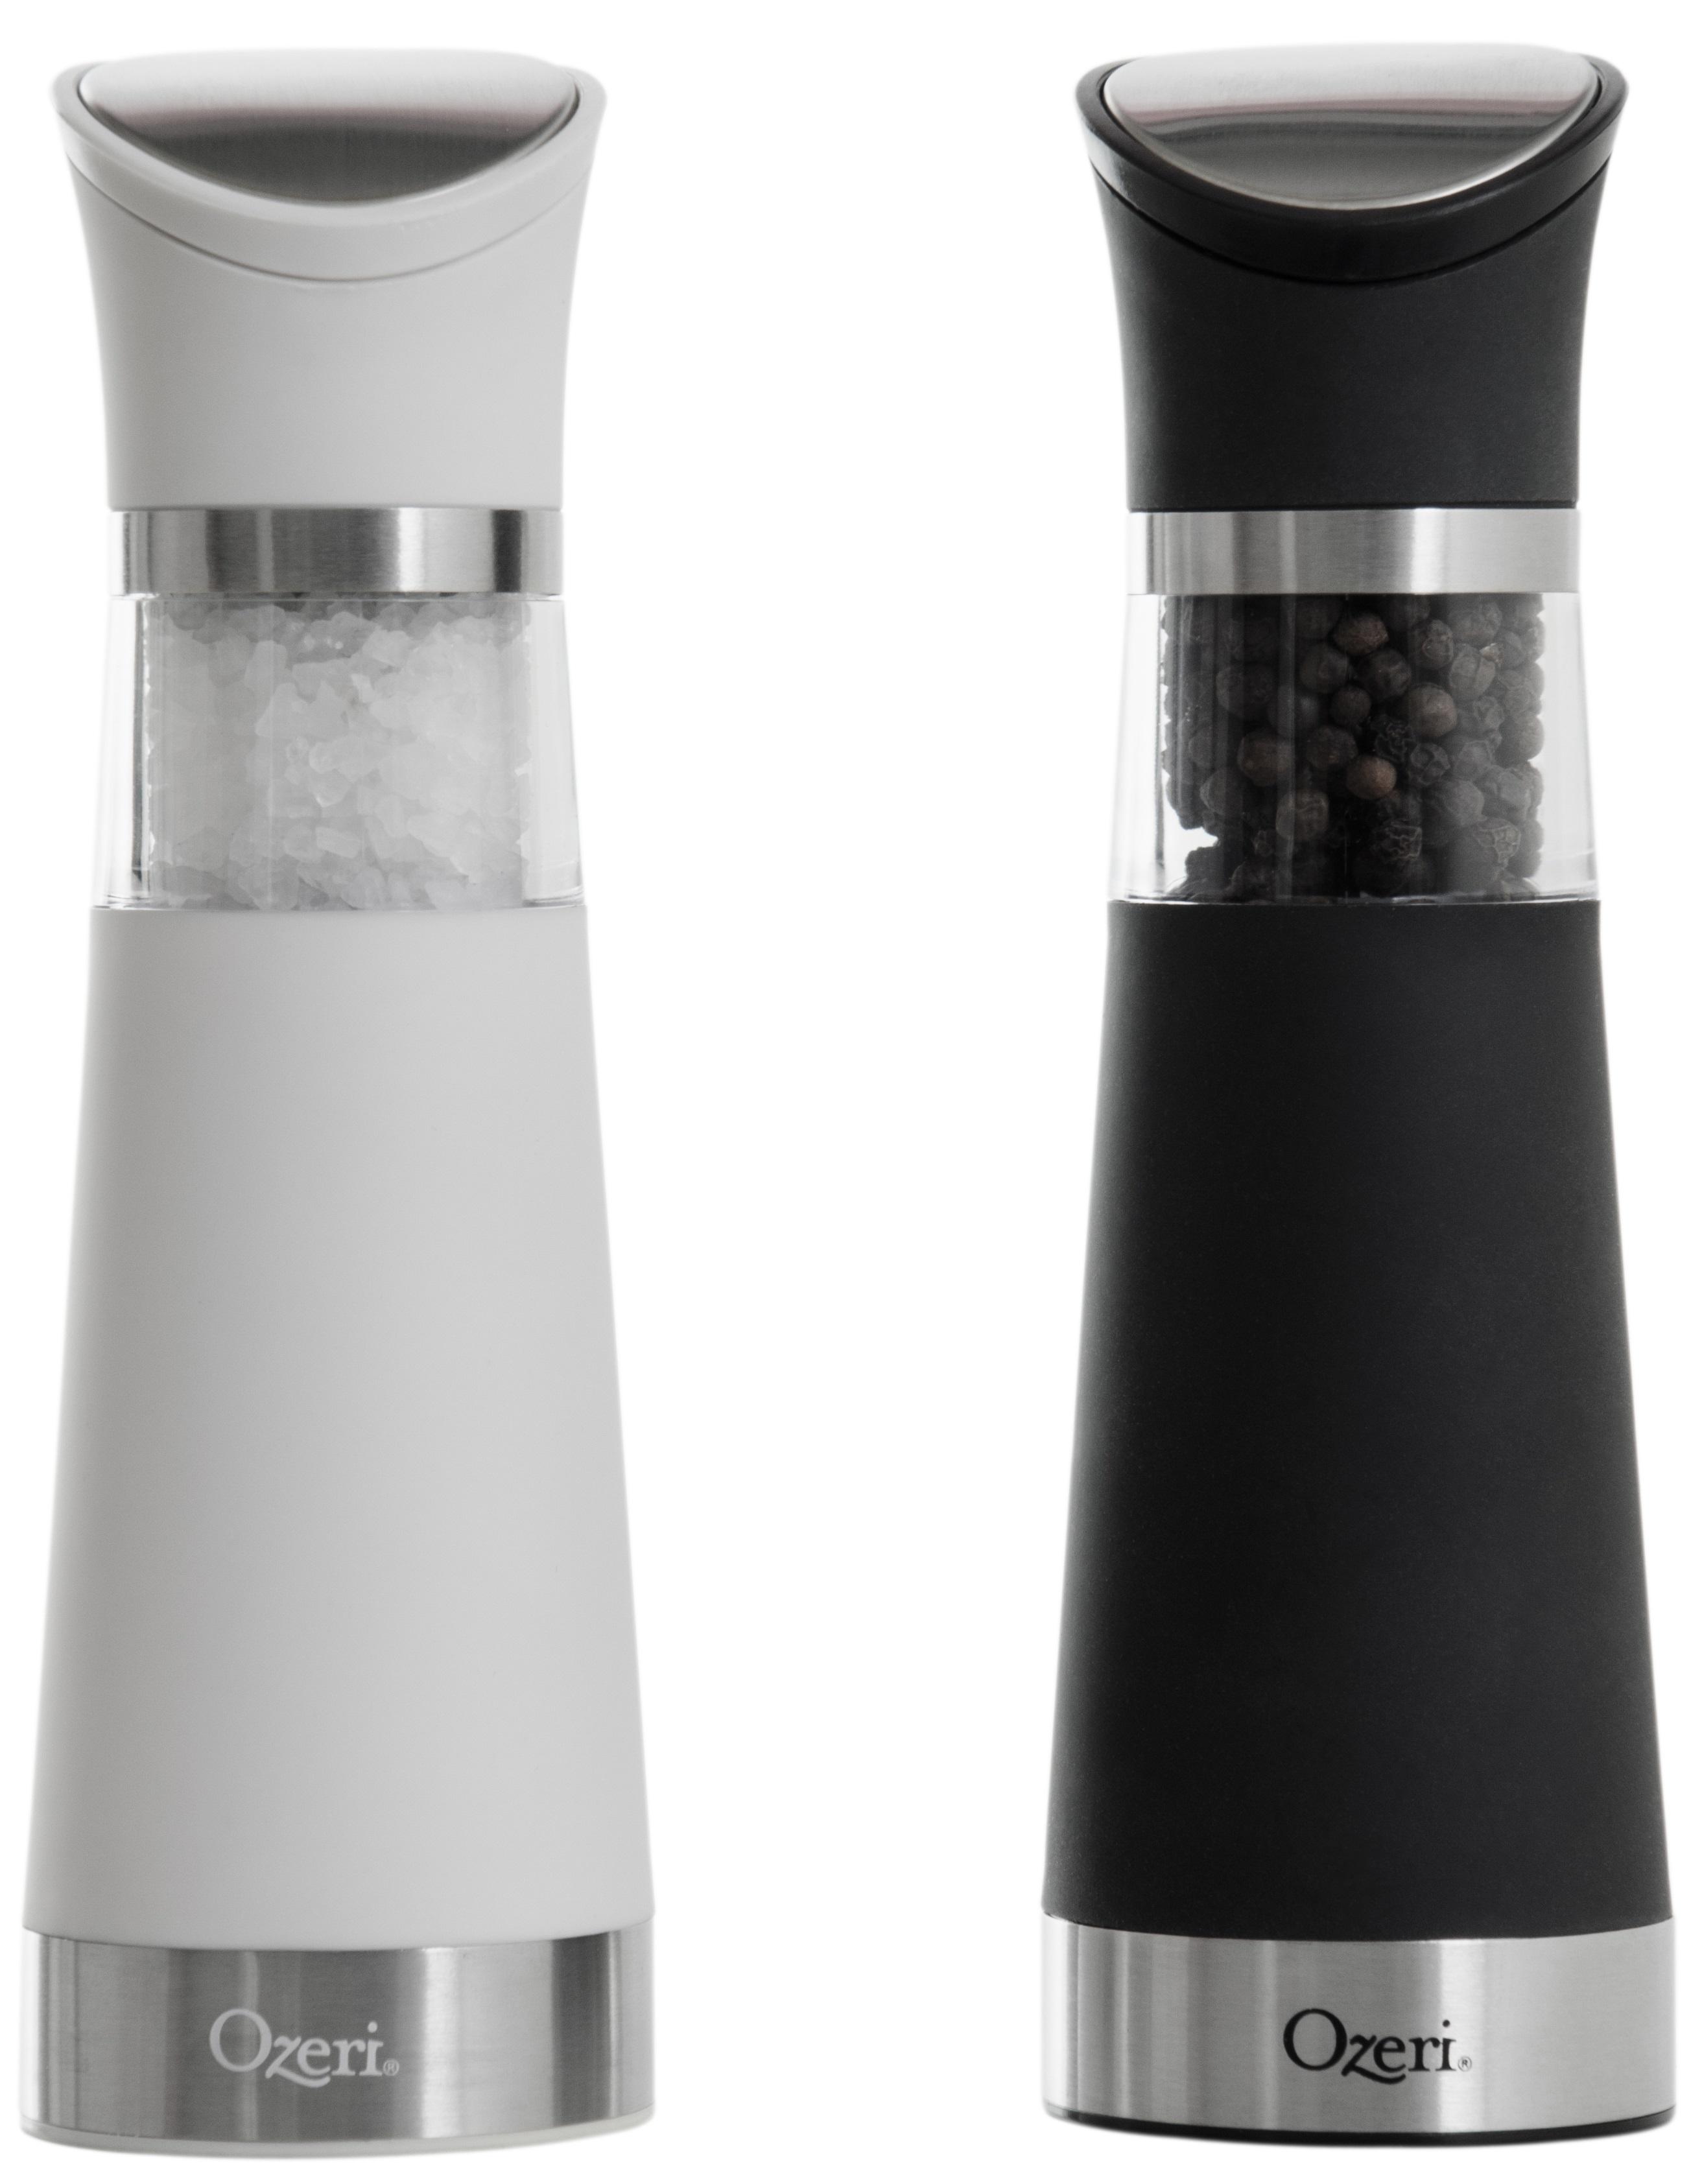 Ozeri Graviti Pro Electric Salt and Pepper Grinder Set - BPA-Free